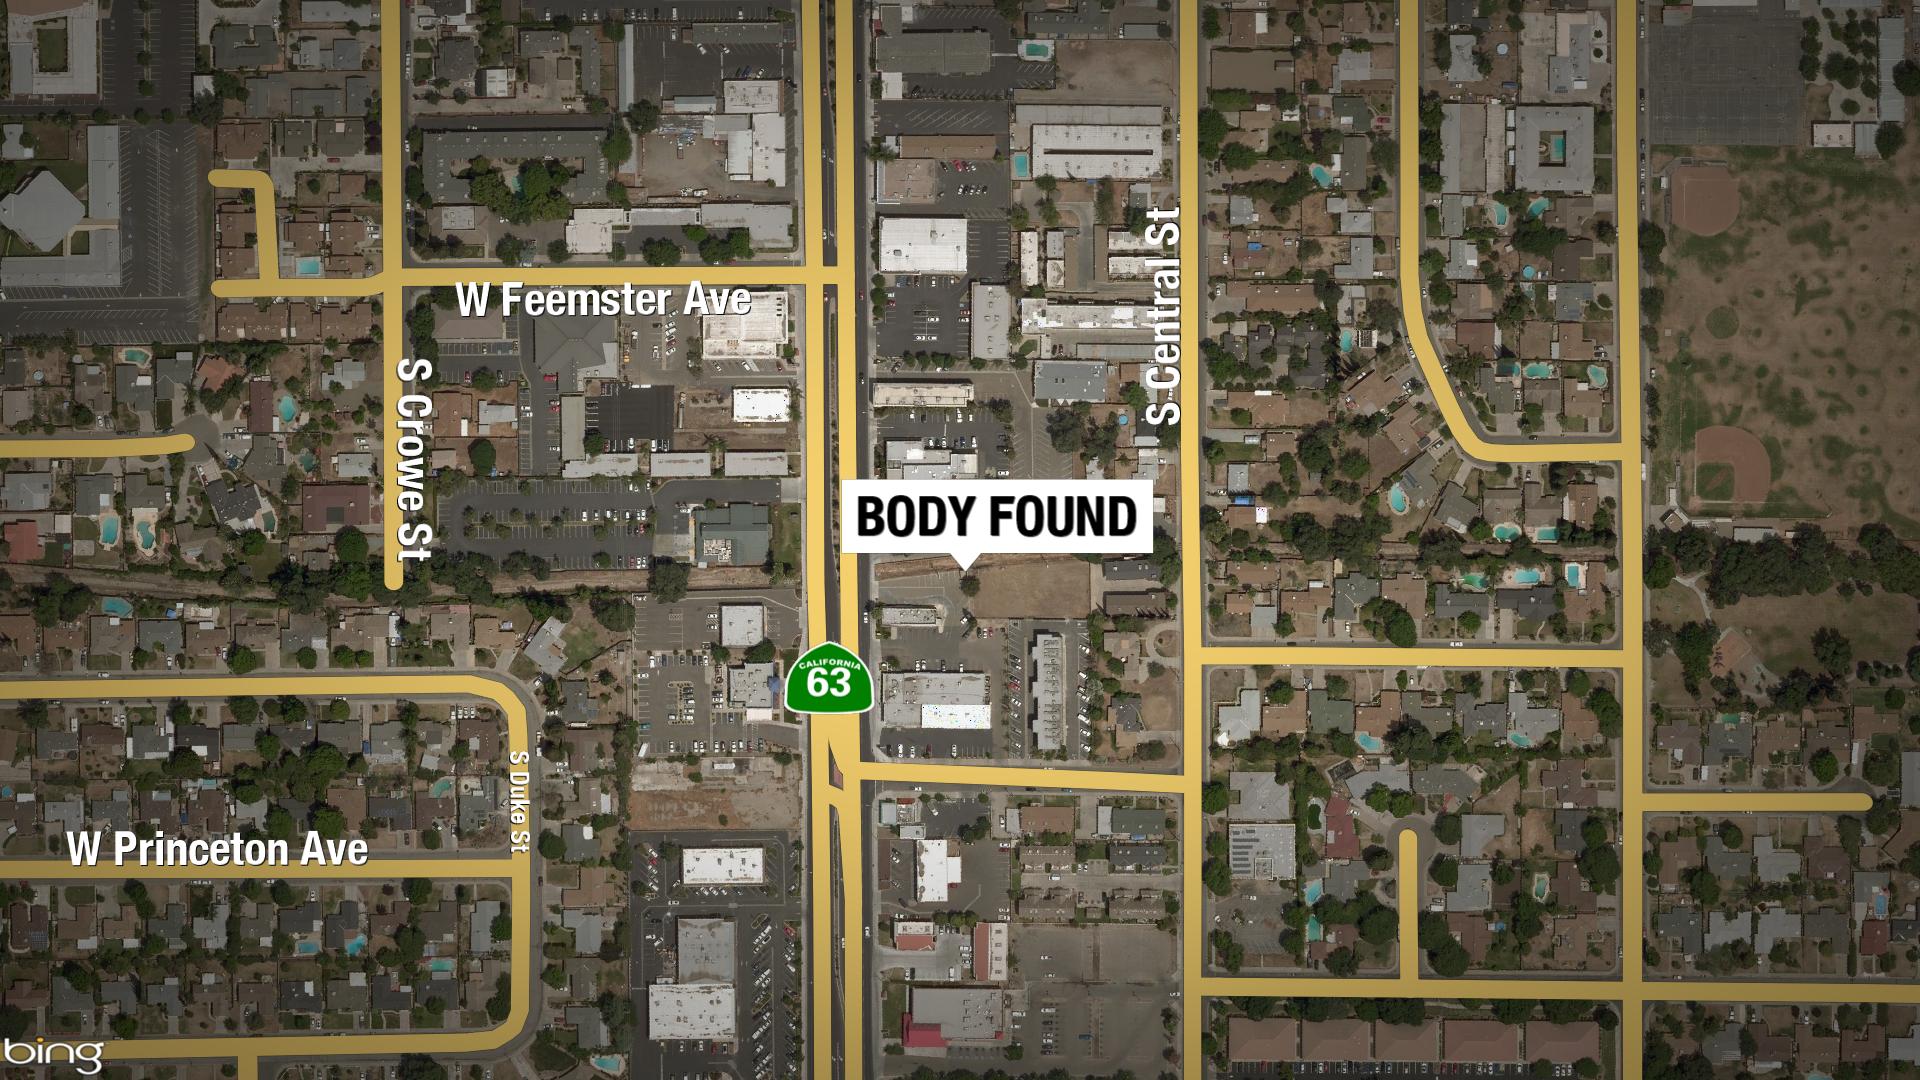 Woman found dead in Visalia on Friday morning identified